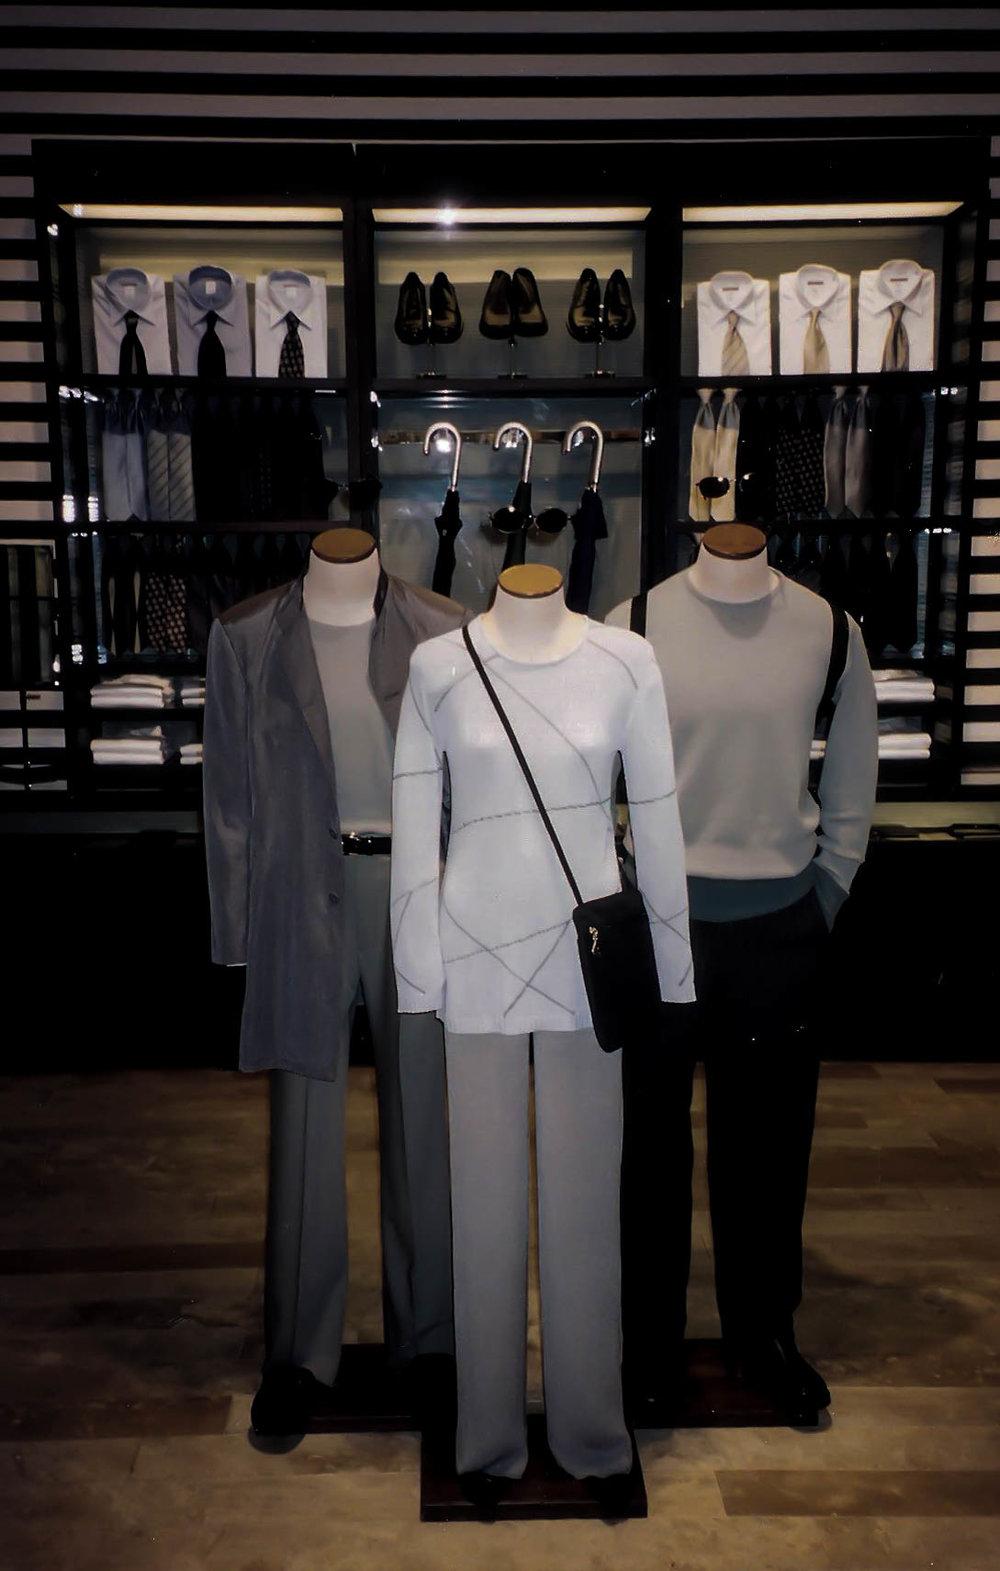 stores_14 (2).jpg